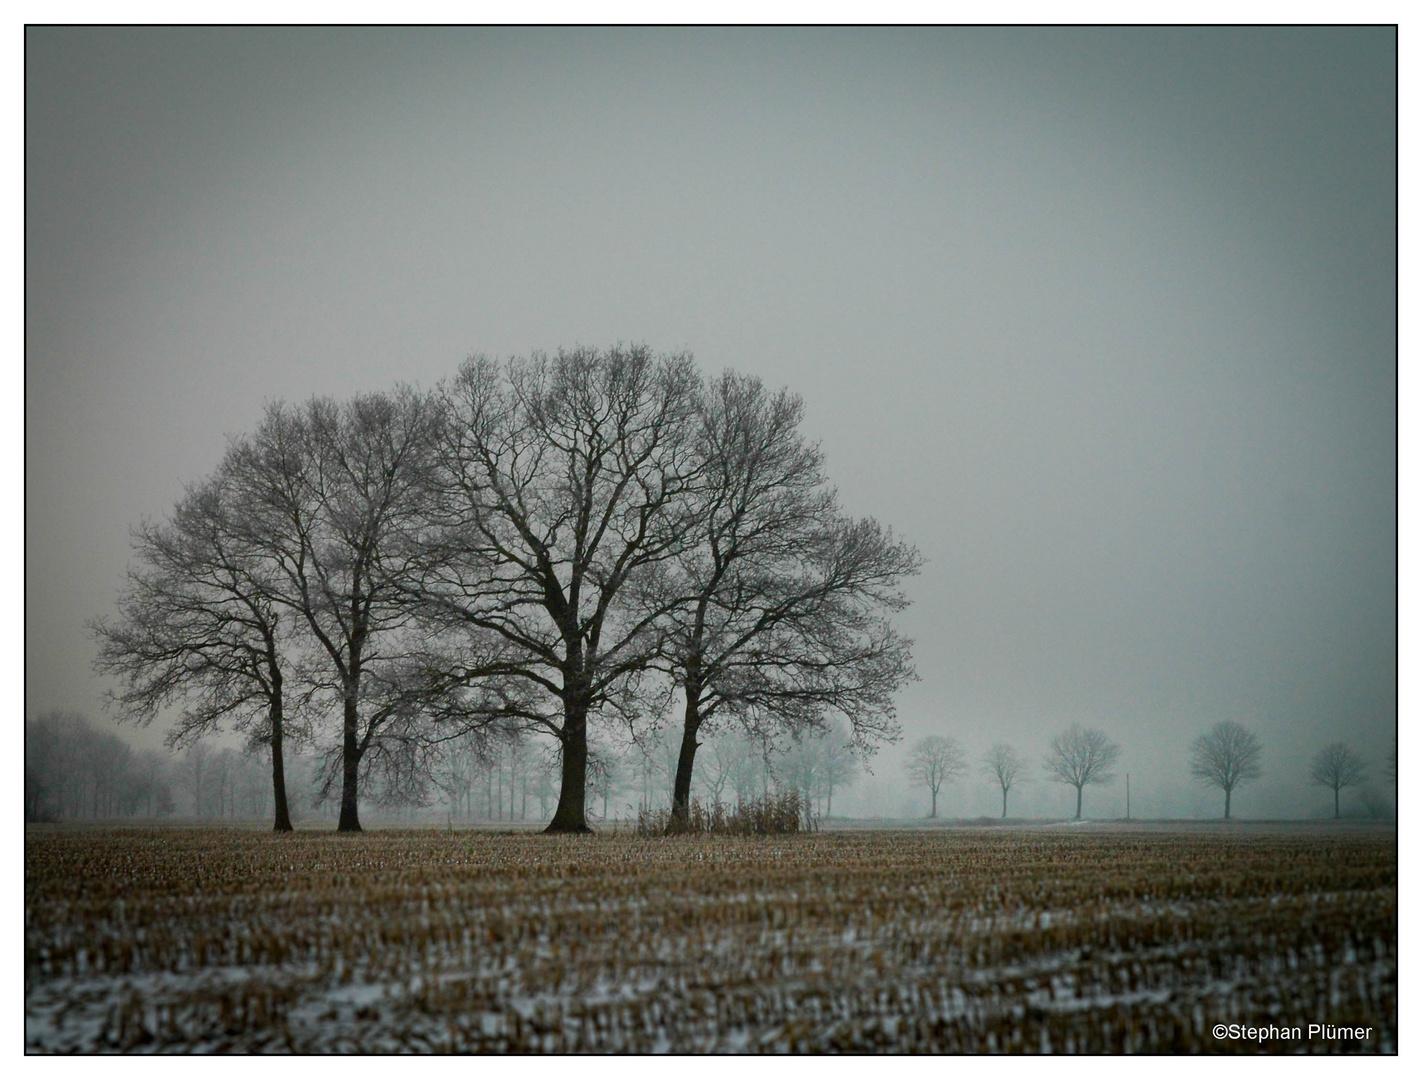 Rhauderfehn Bäume im Dunst